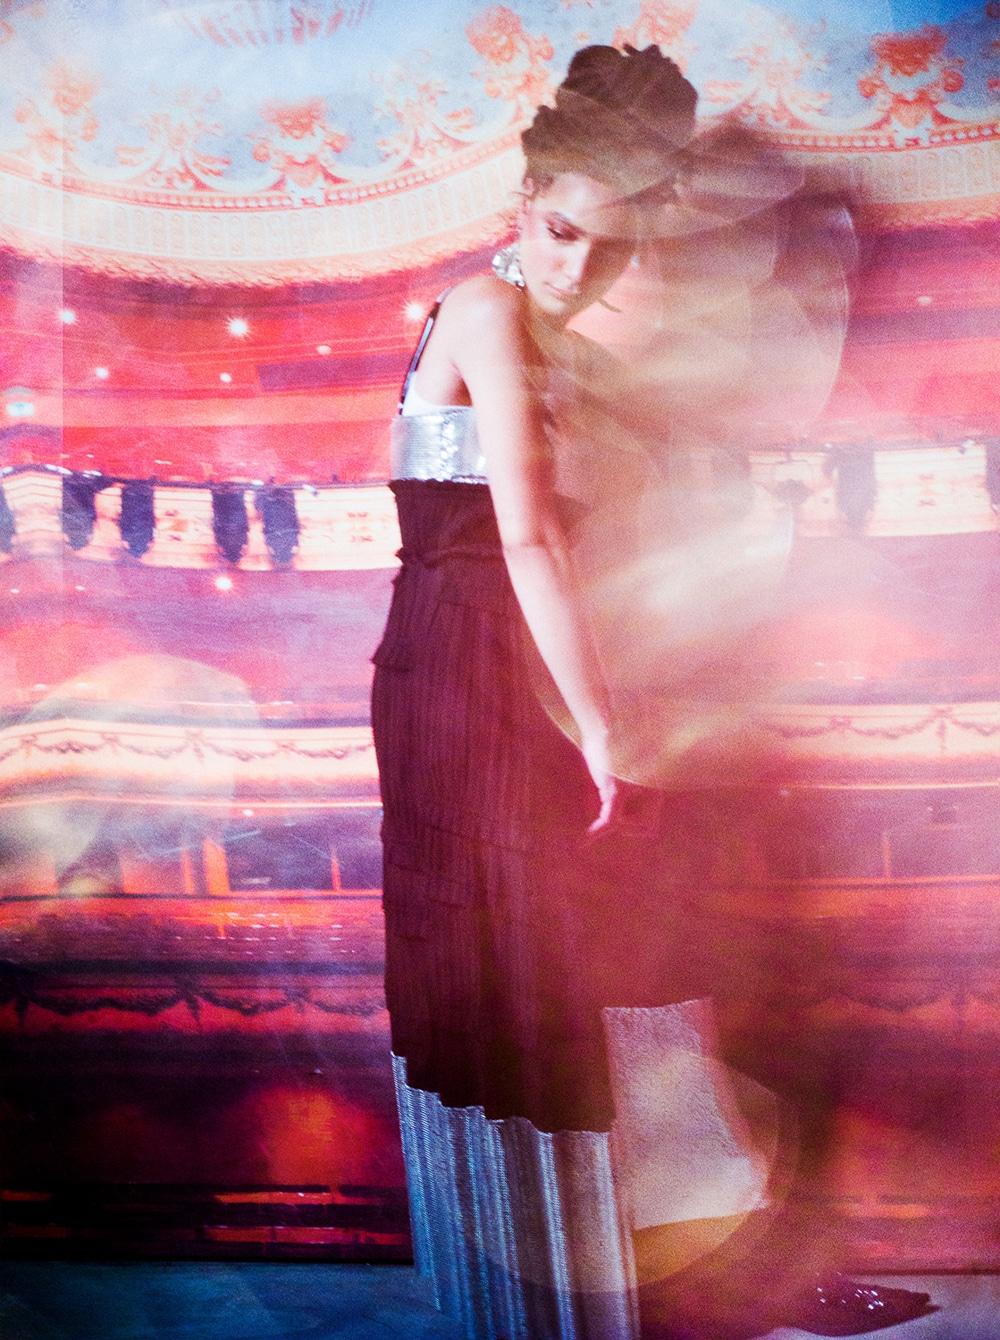 Flaunt-Magazine-20th-Anniversary-Cover-Sasha-Lane-Ioulex-5.jpg